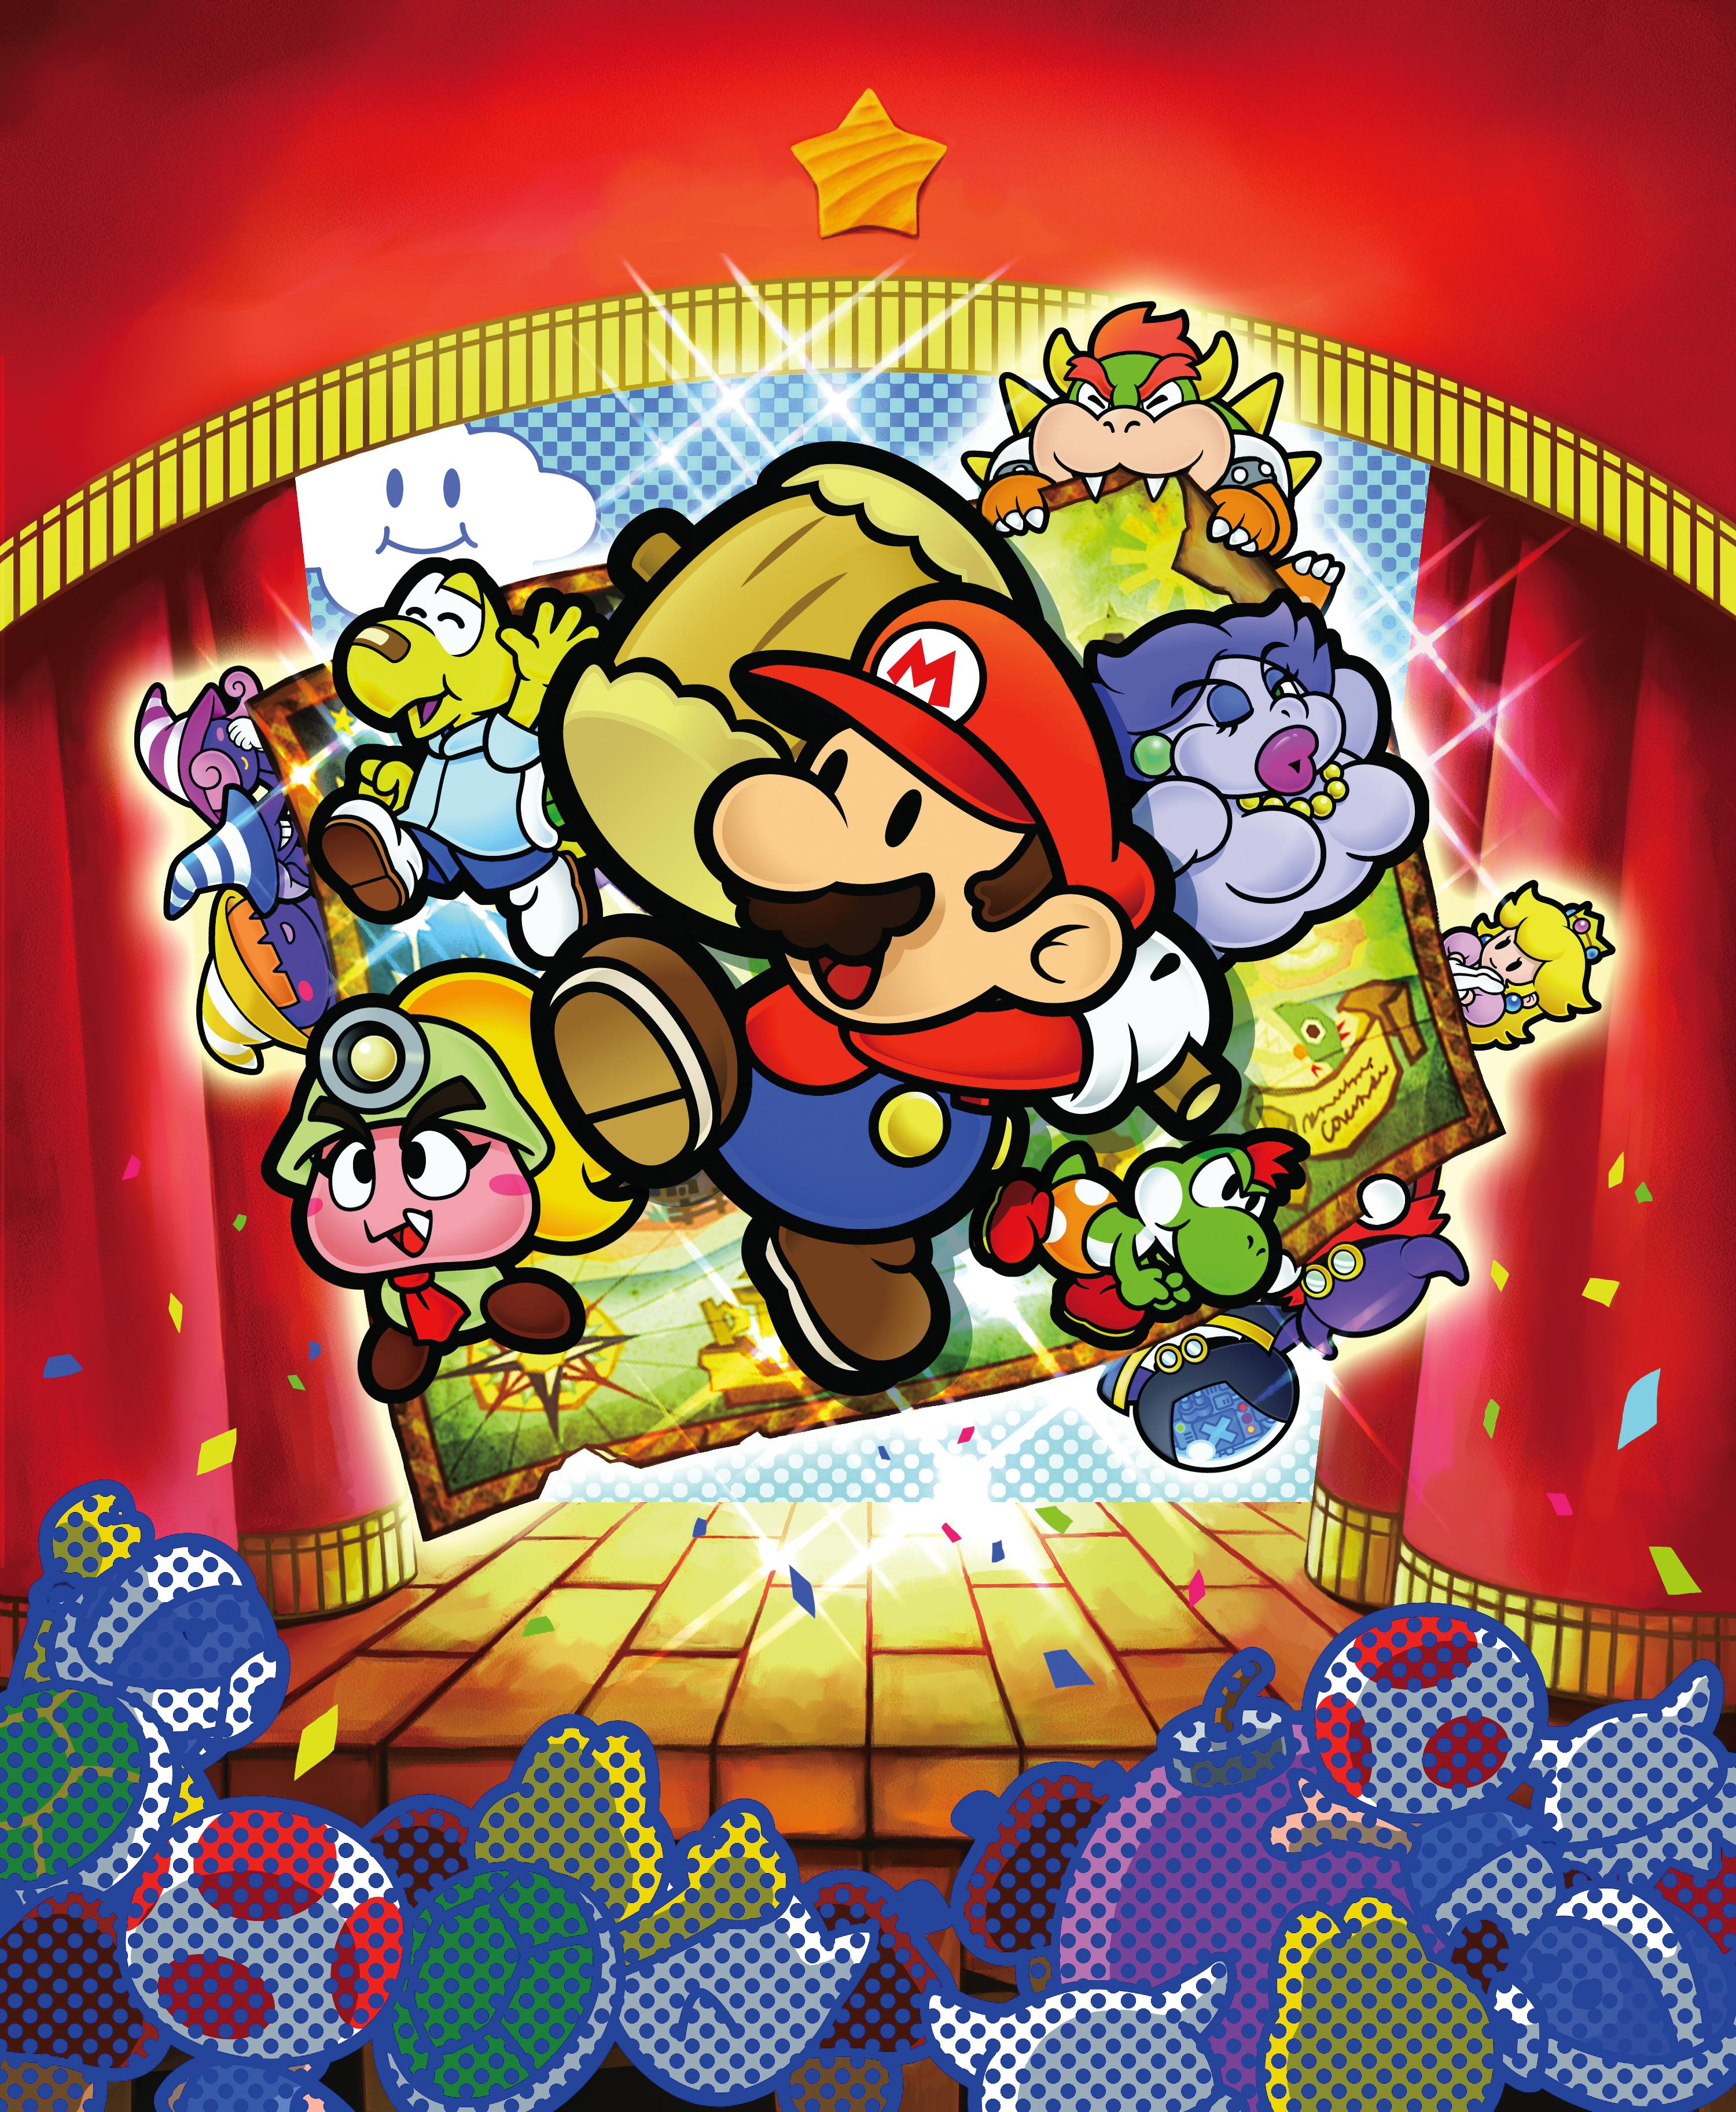 Paper Mario The Thousand Year Door Gamecube Concept Artwork